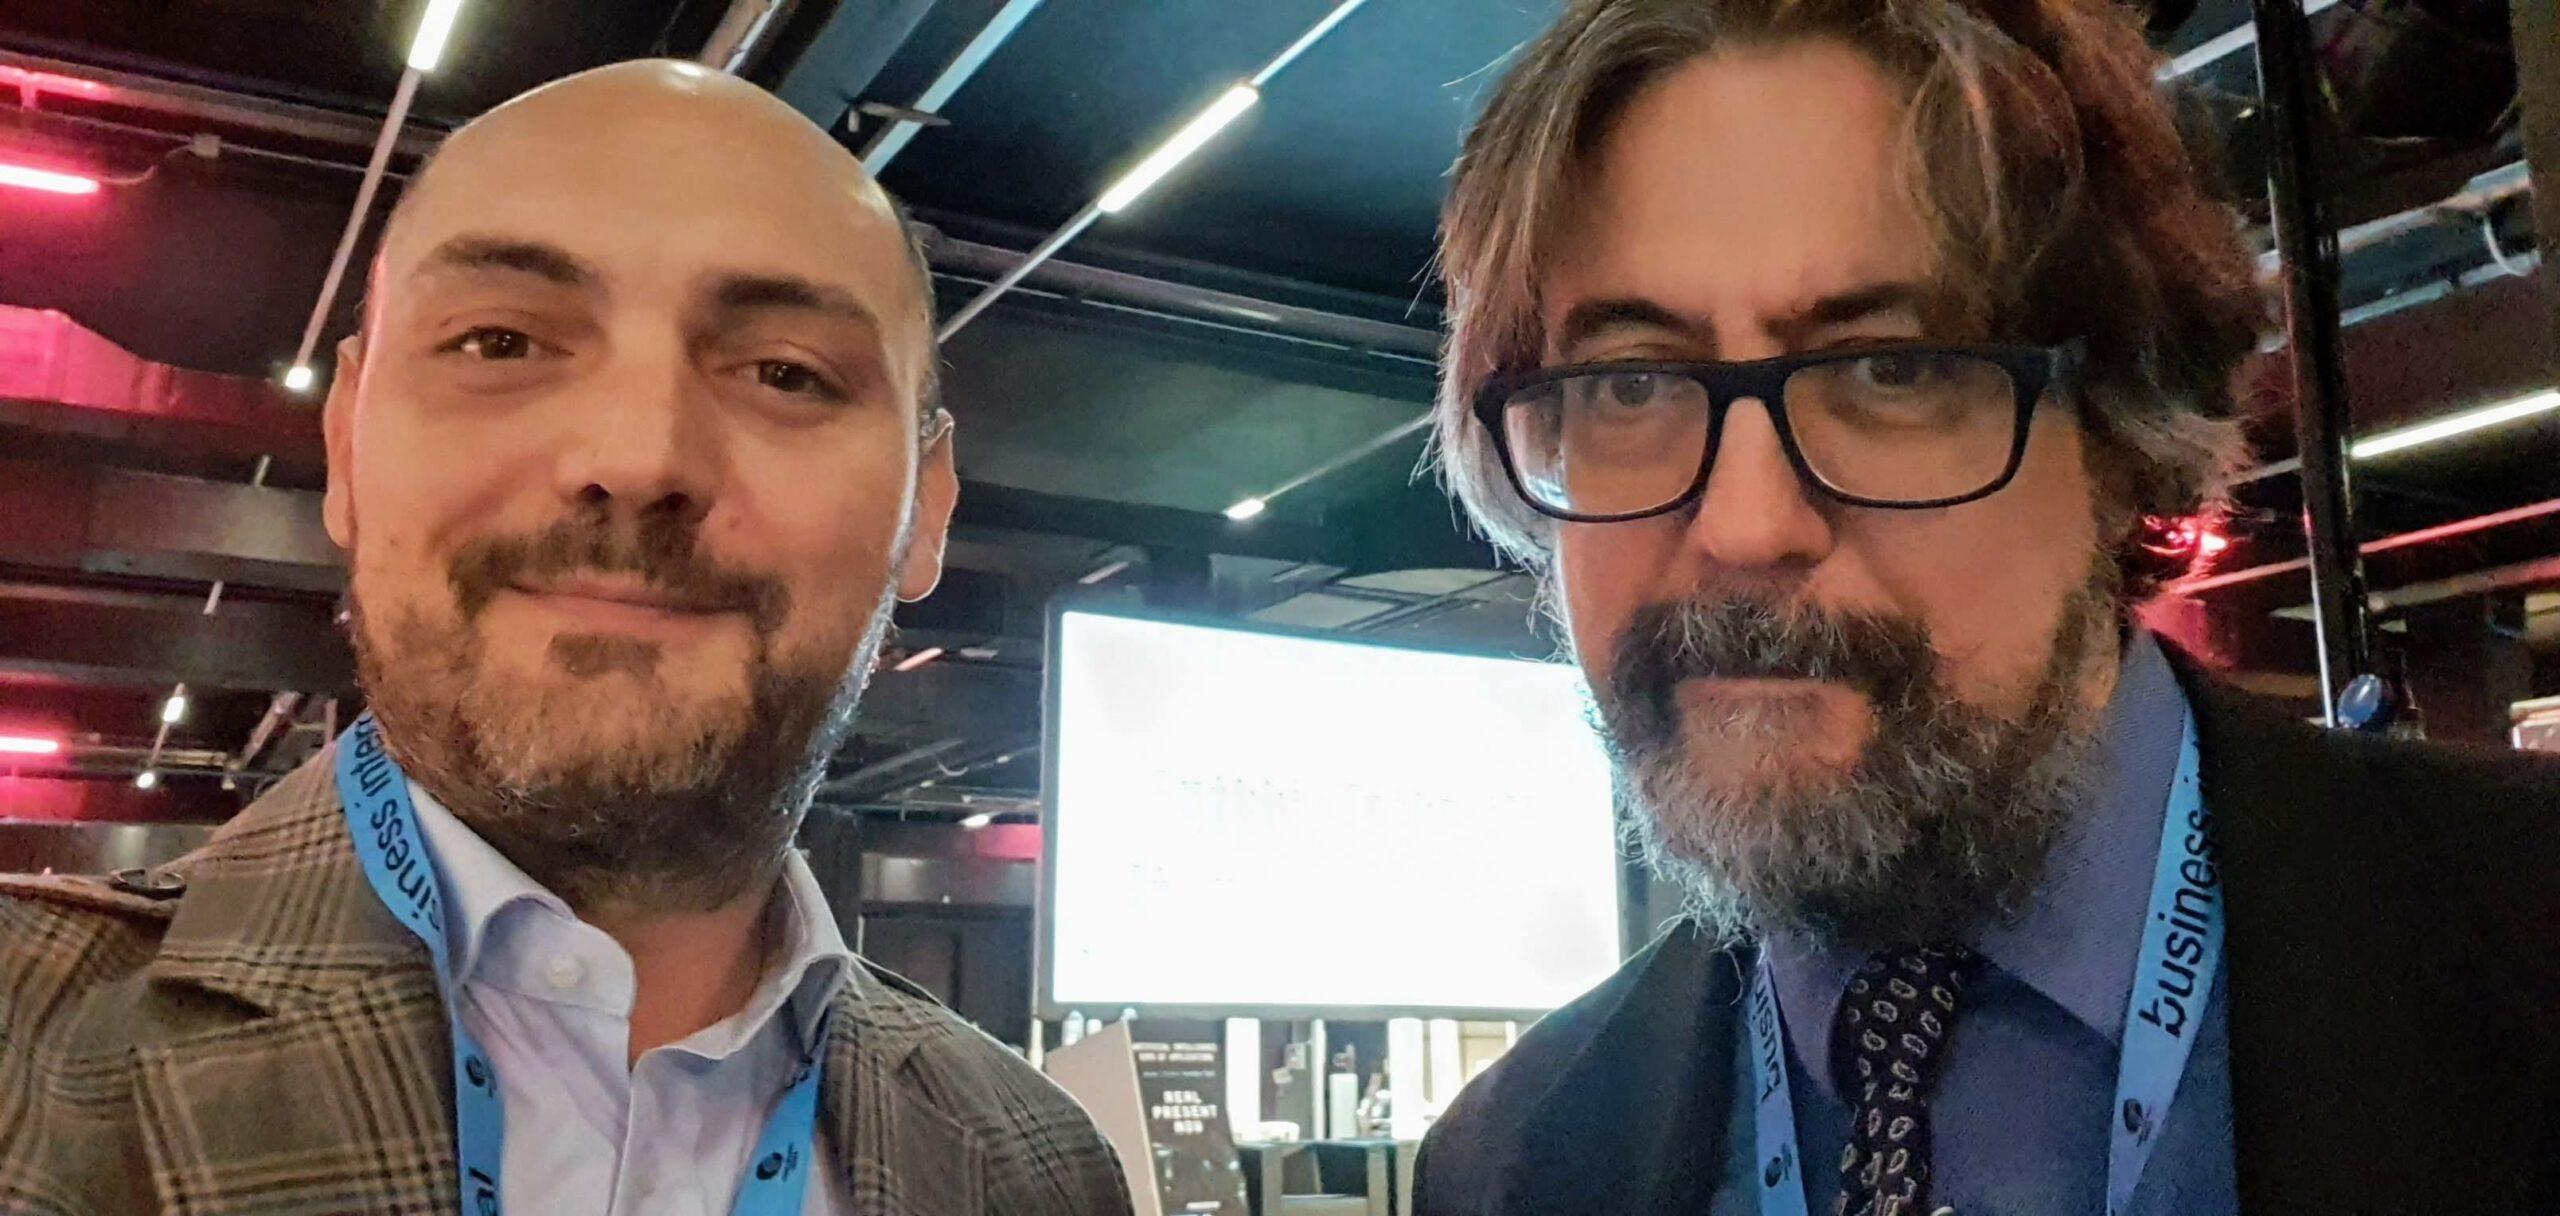 Giovanni Sacheli & Bill Slawski @ SMXL Milan 2019